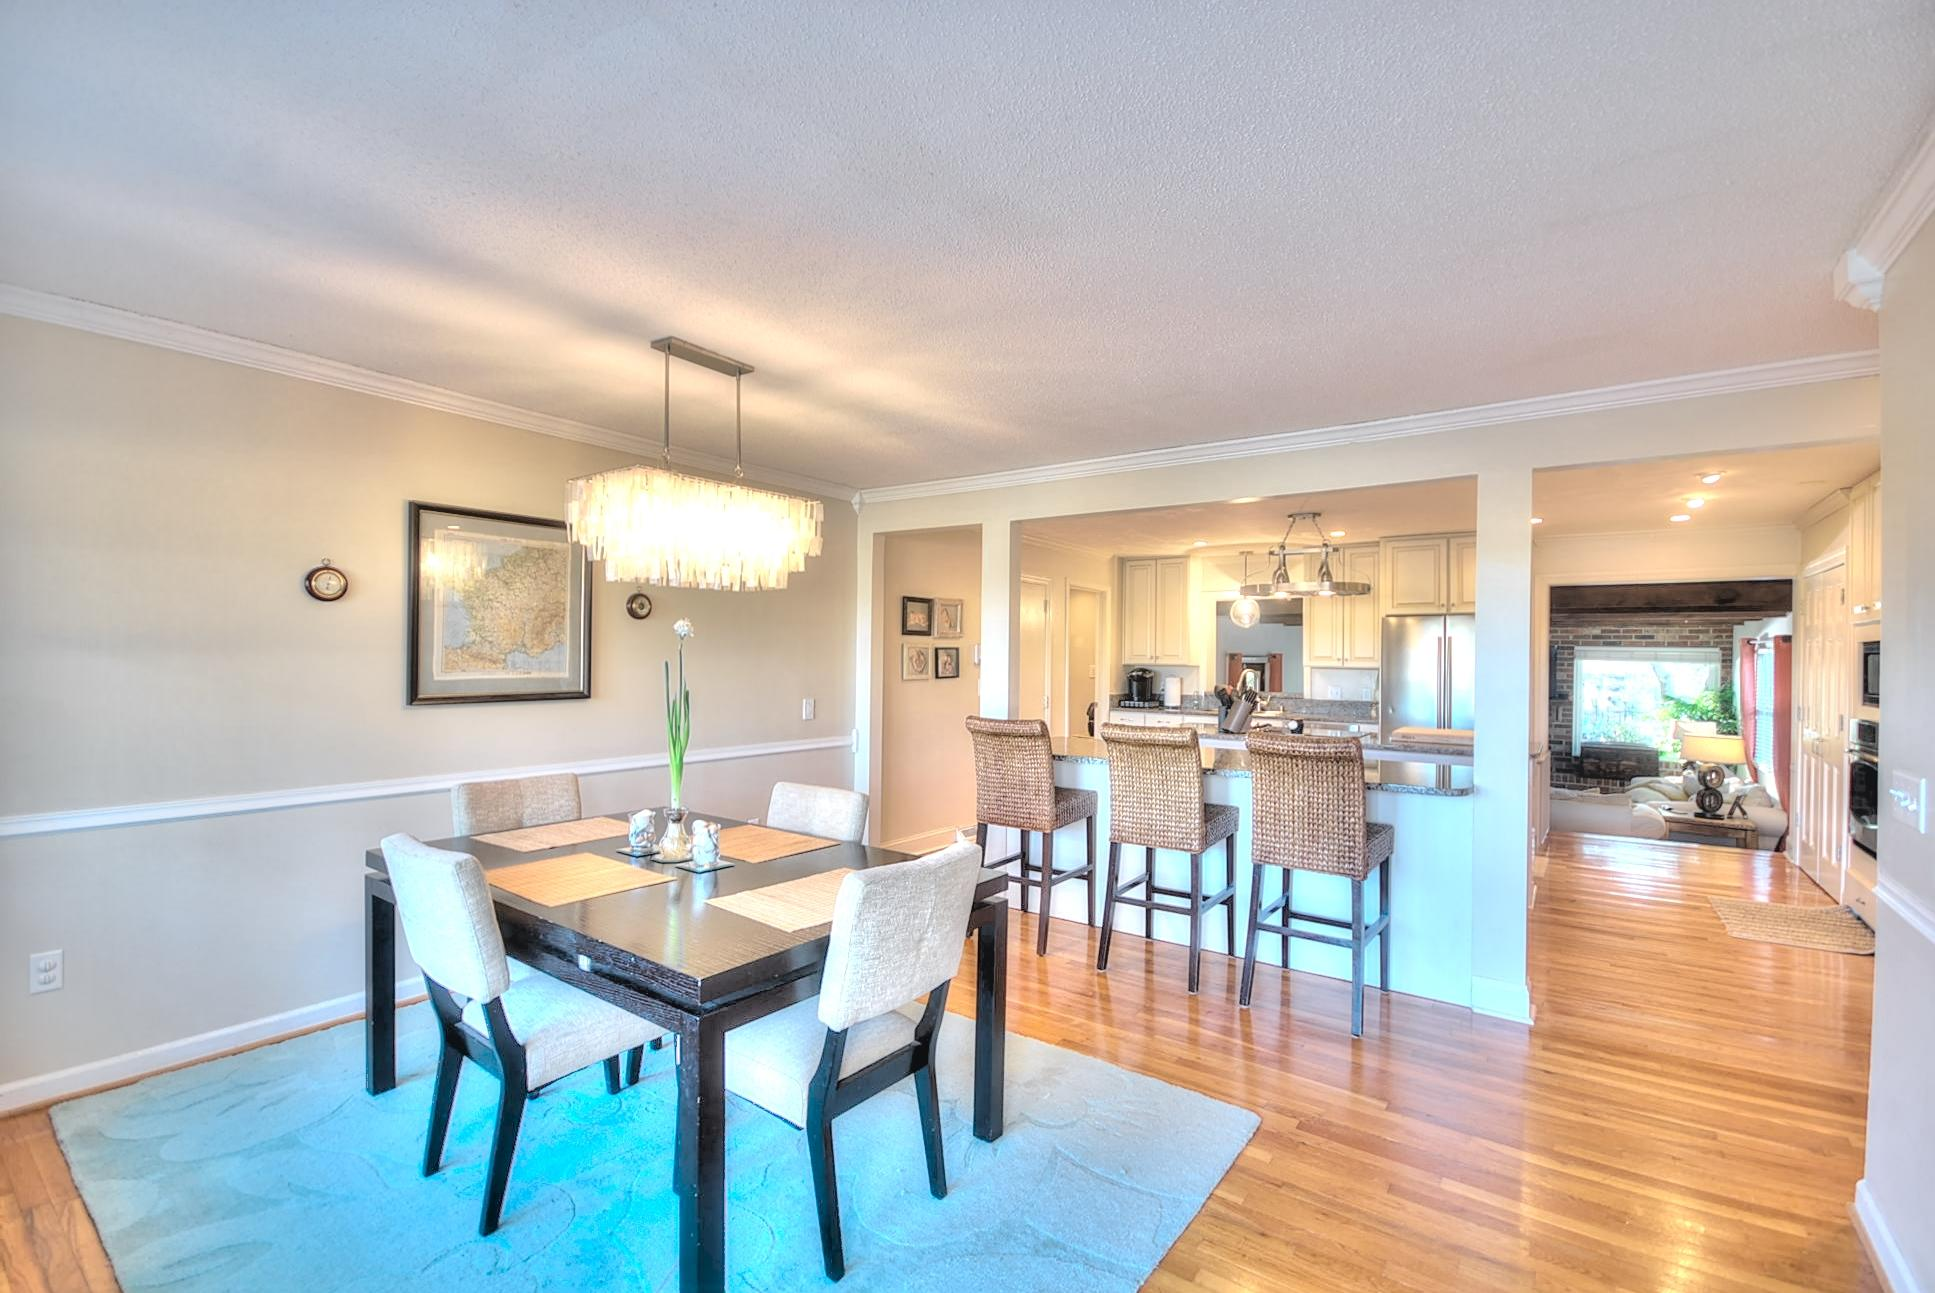 Capri Isles Homes For Sale - 213 Wappoo, Charleston, SC - 51